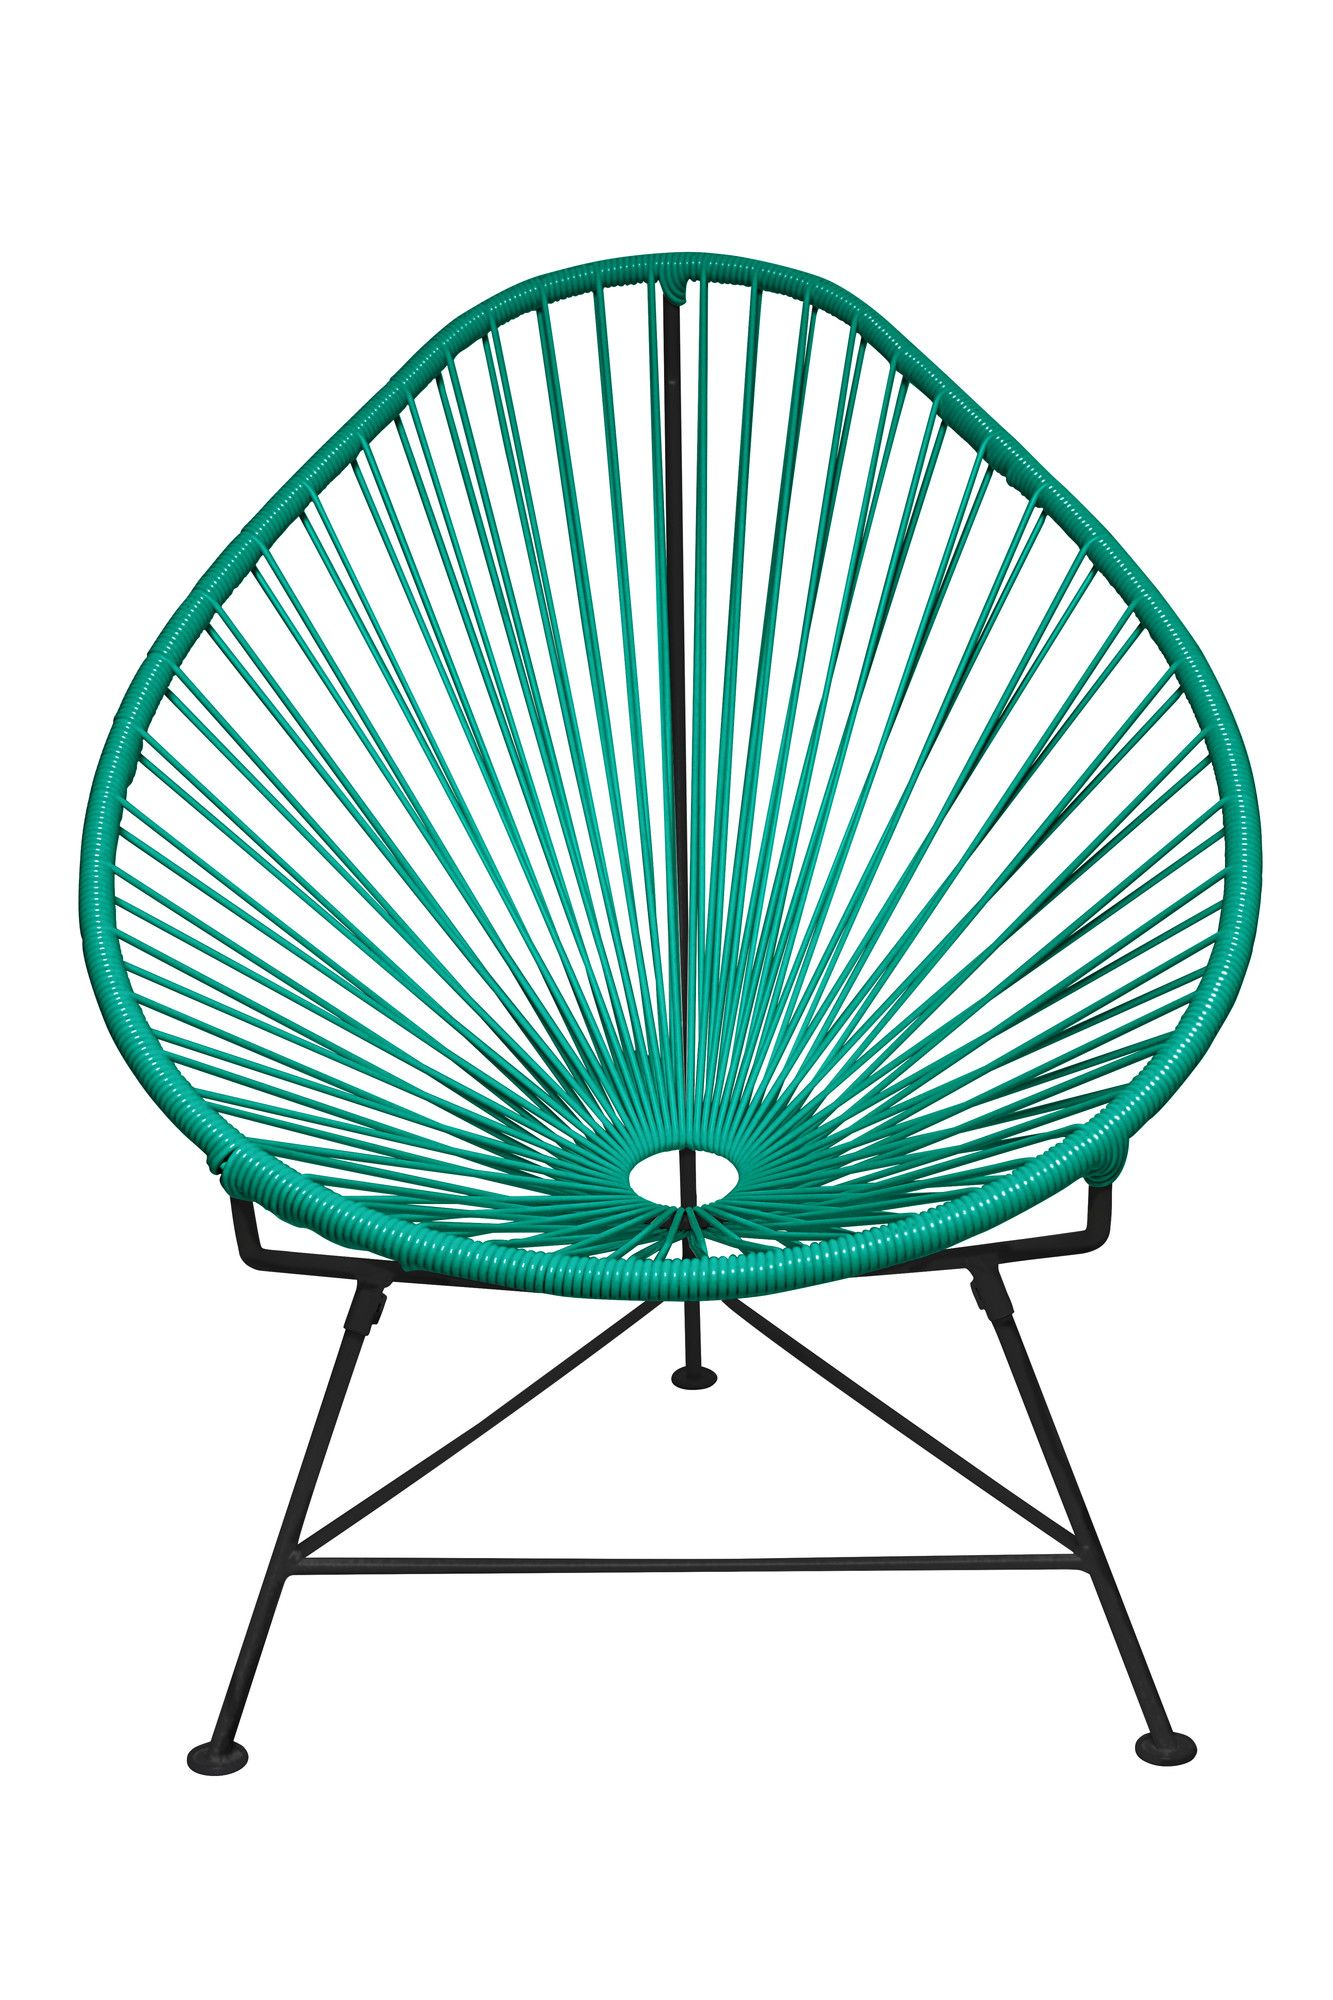 Acapulco Baby Papasan Chair | CC sims 4 ? | Pinterest | Papasan chair Sims and Skyrim  sc 1 st  Pinterest & Acapulco Baby Papasan Chair | CC sims 4 ? | Pinterest | Papasan ...